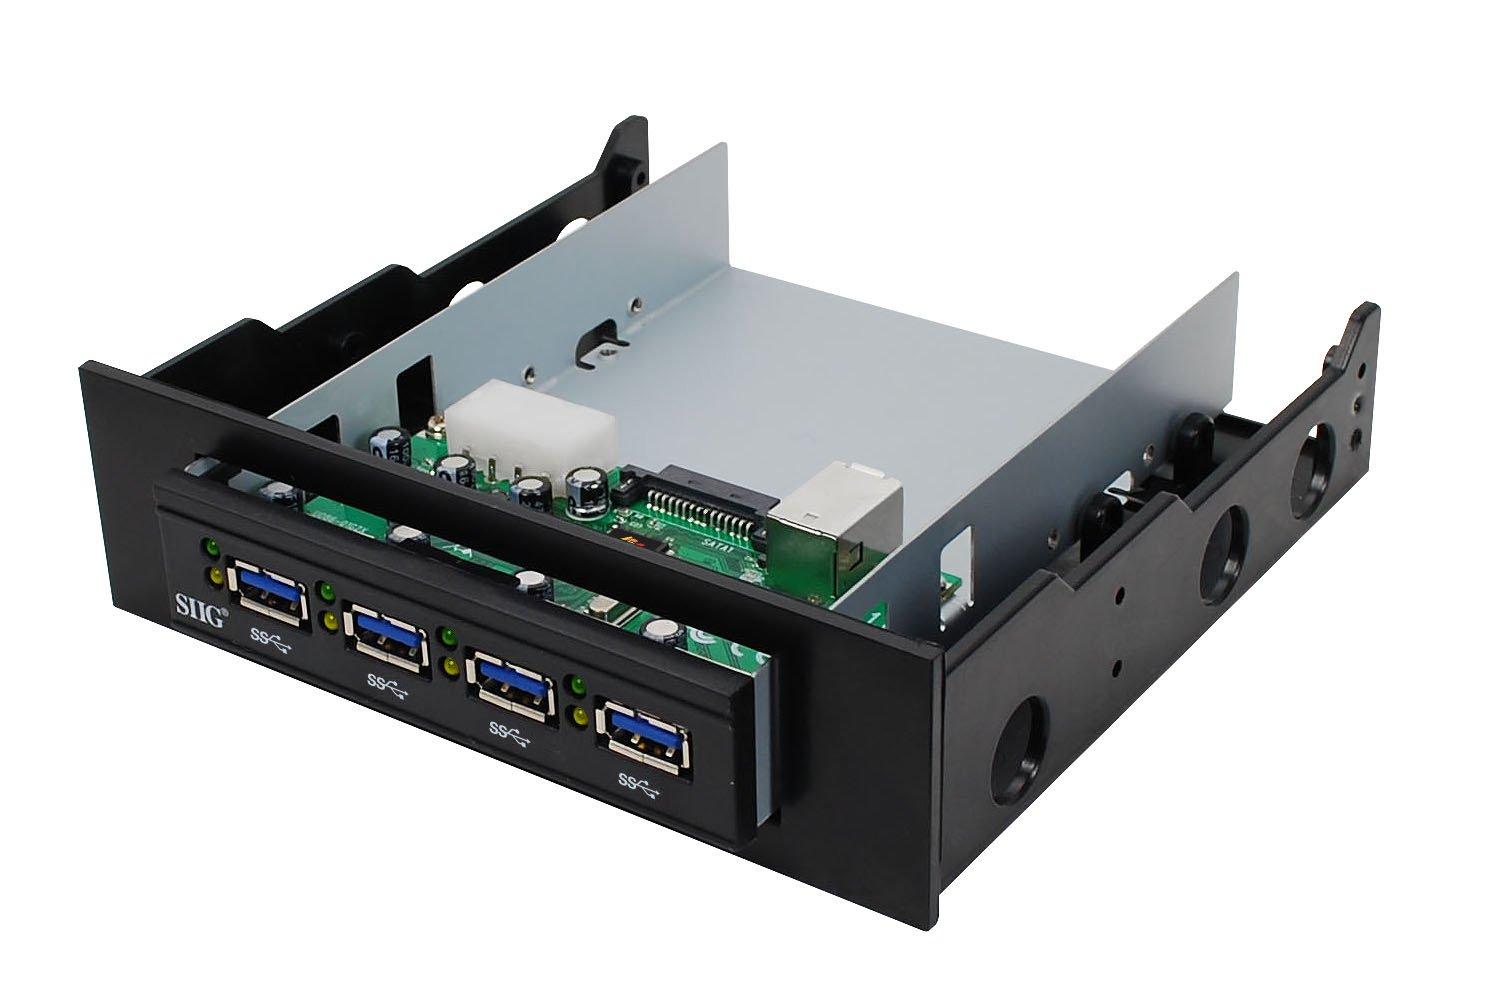 SIIG SuperSpeed USB 3.0 4-Port Bay Hub (JU-H40212-S1)